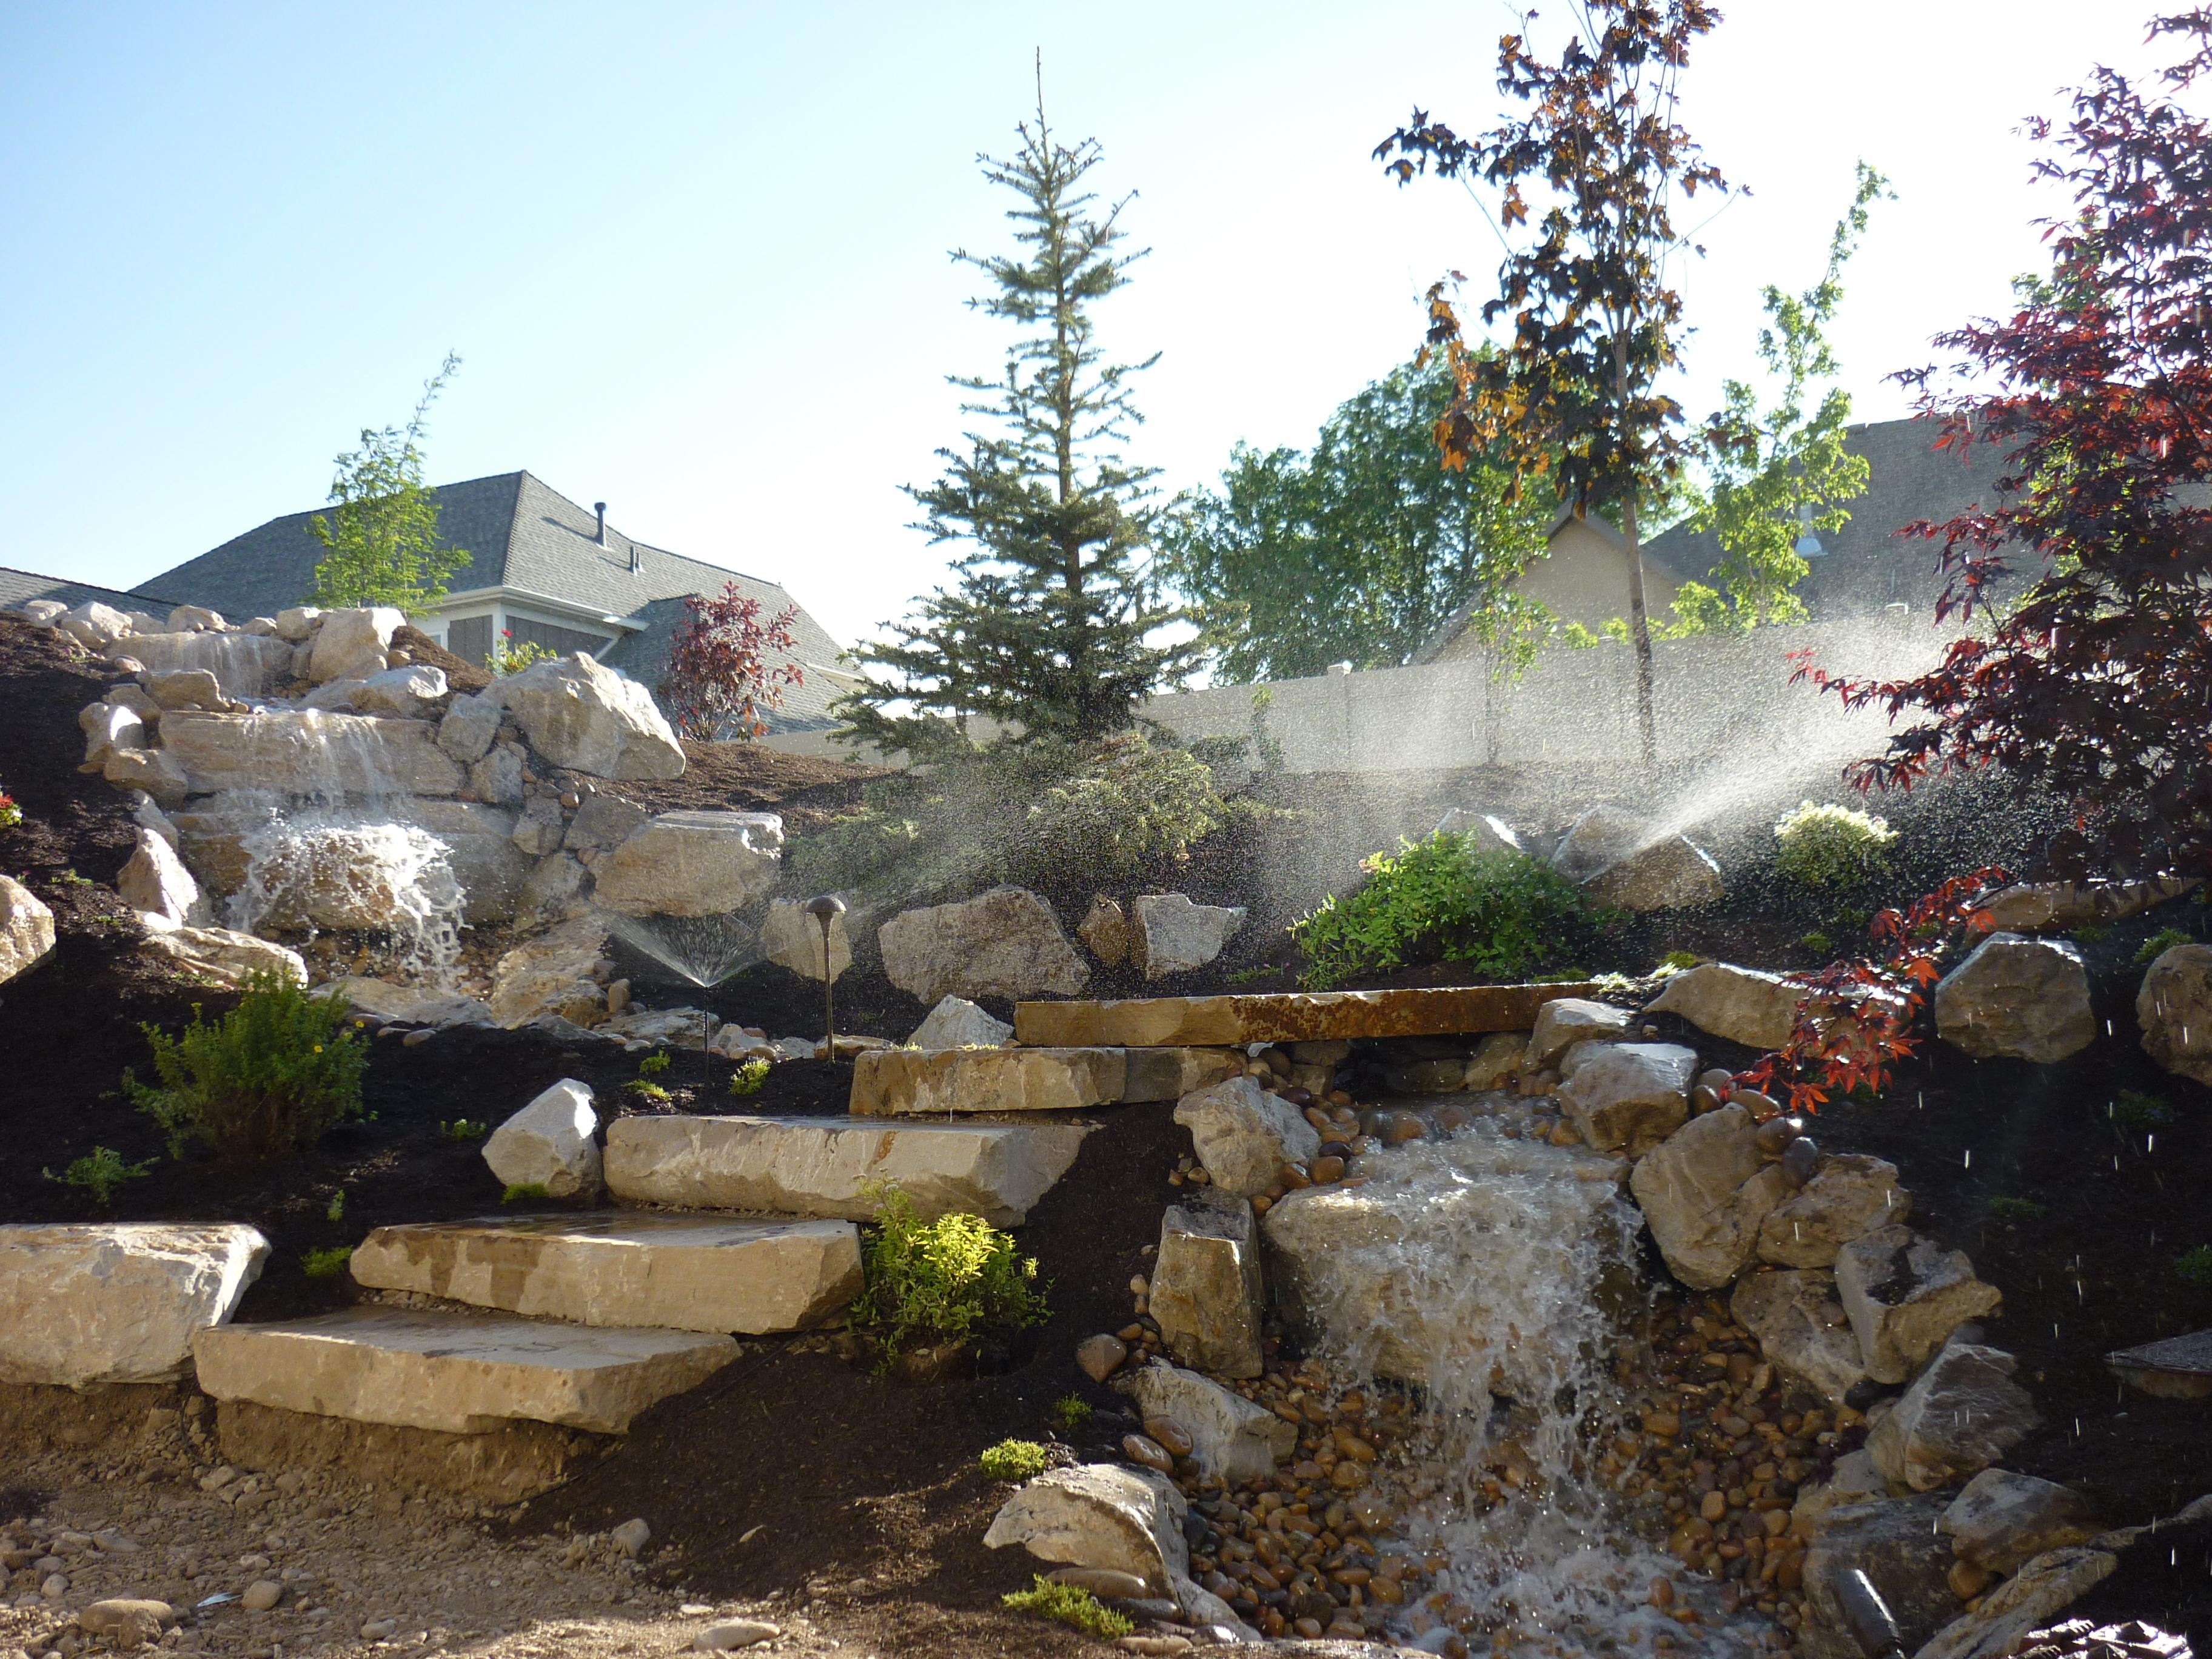 p1000052 chris jensen landscaping in salt lake city and